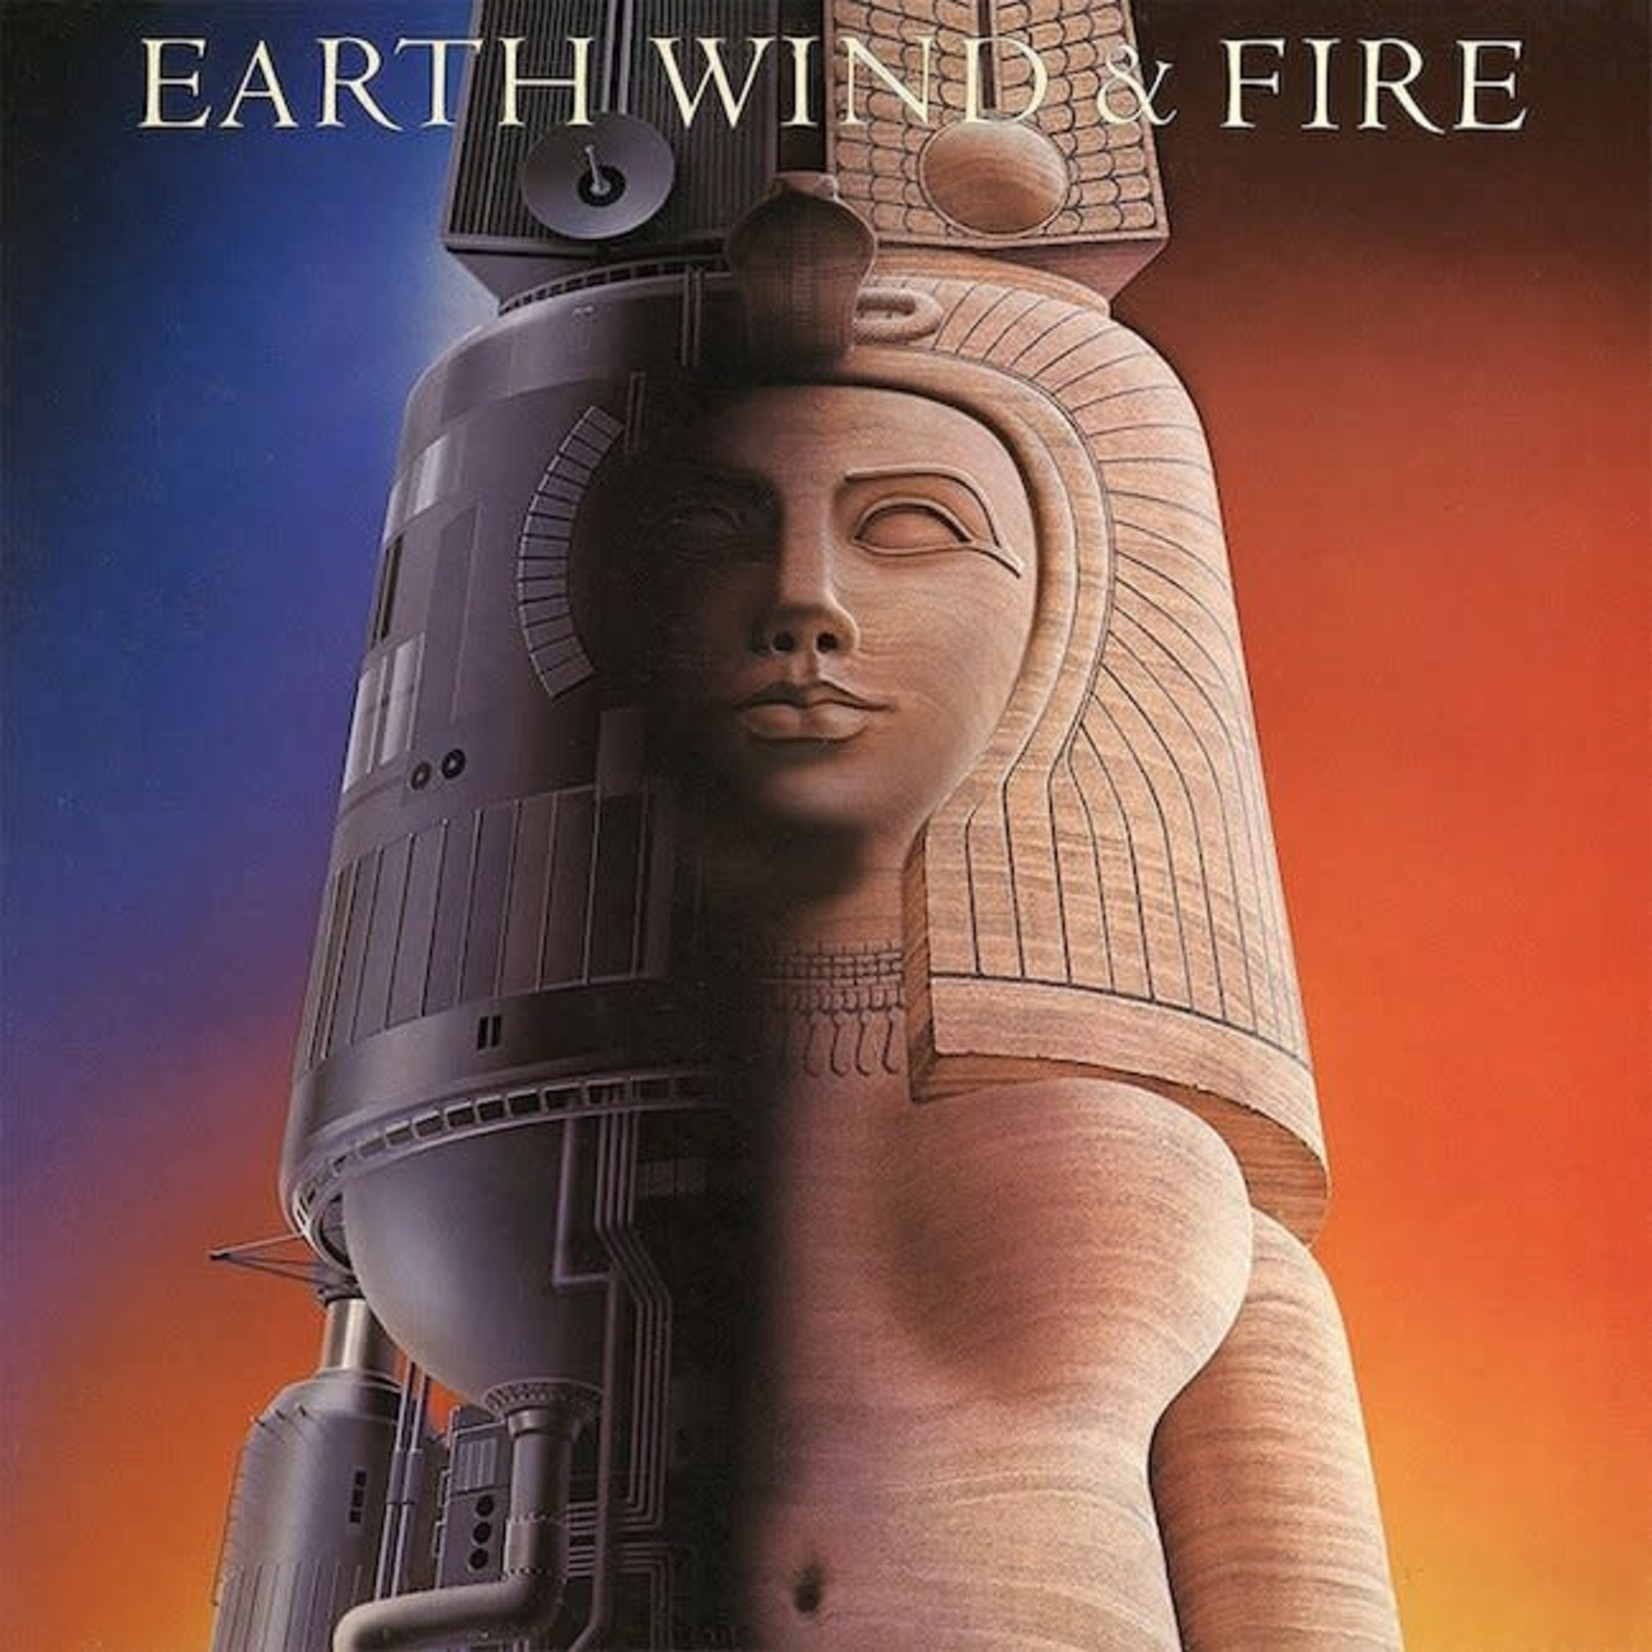 [Vintage] Earth, Wind & Fire: Raise!